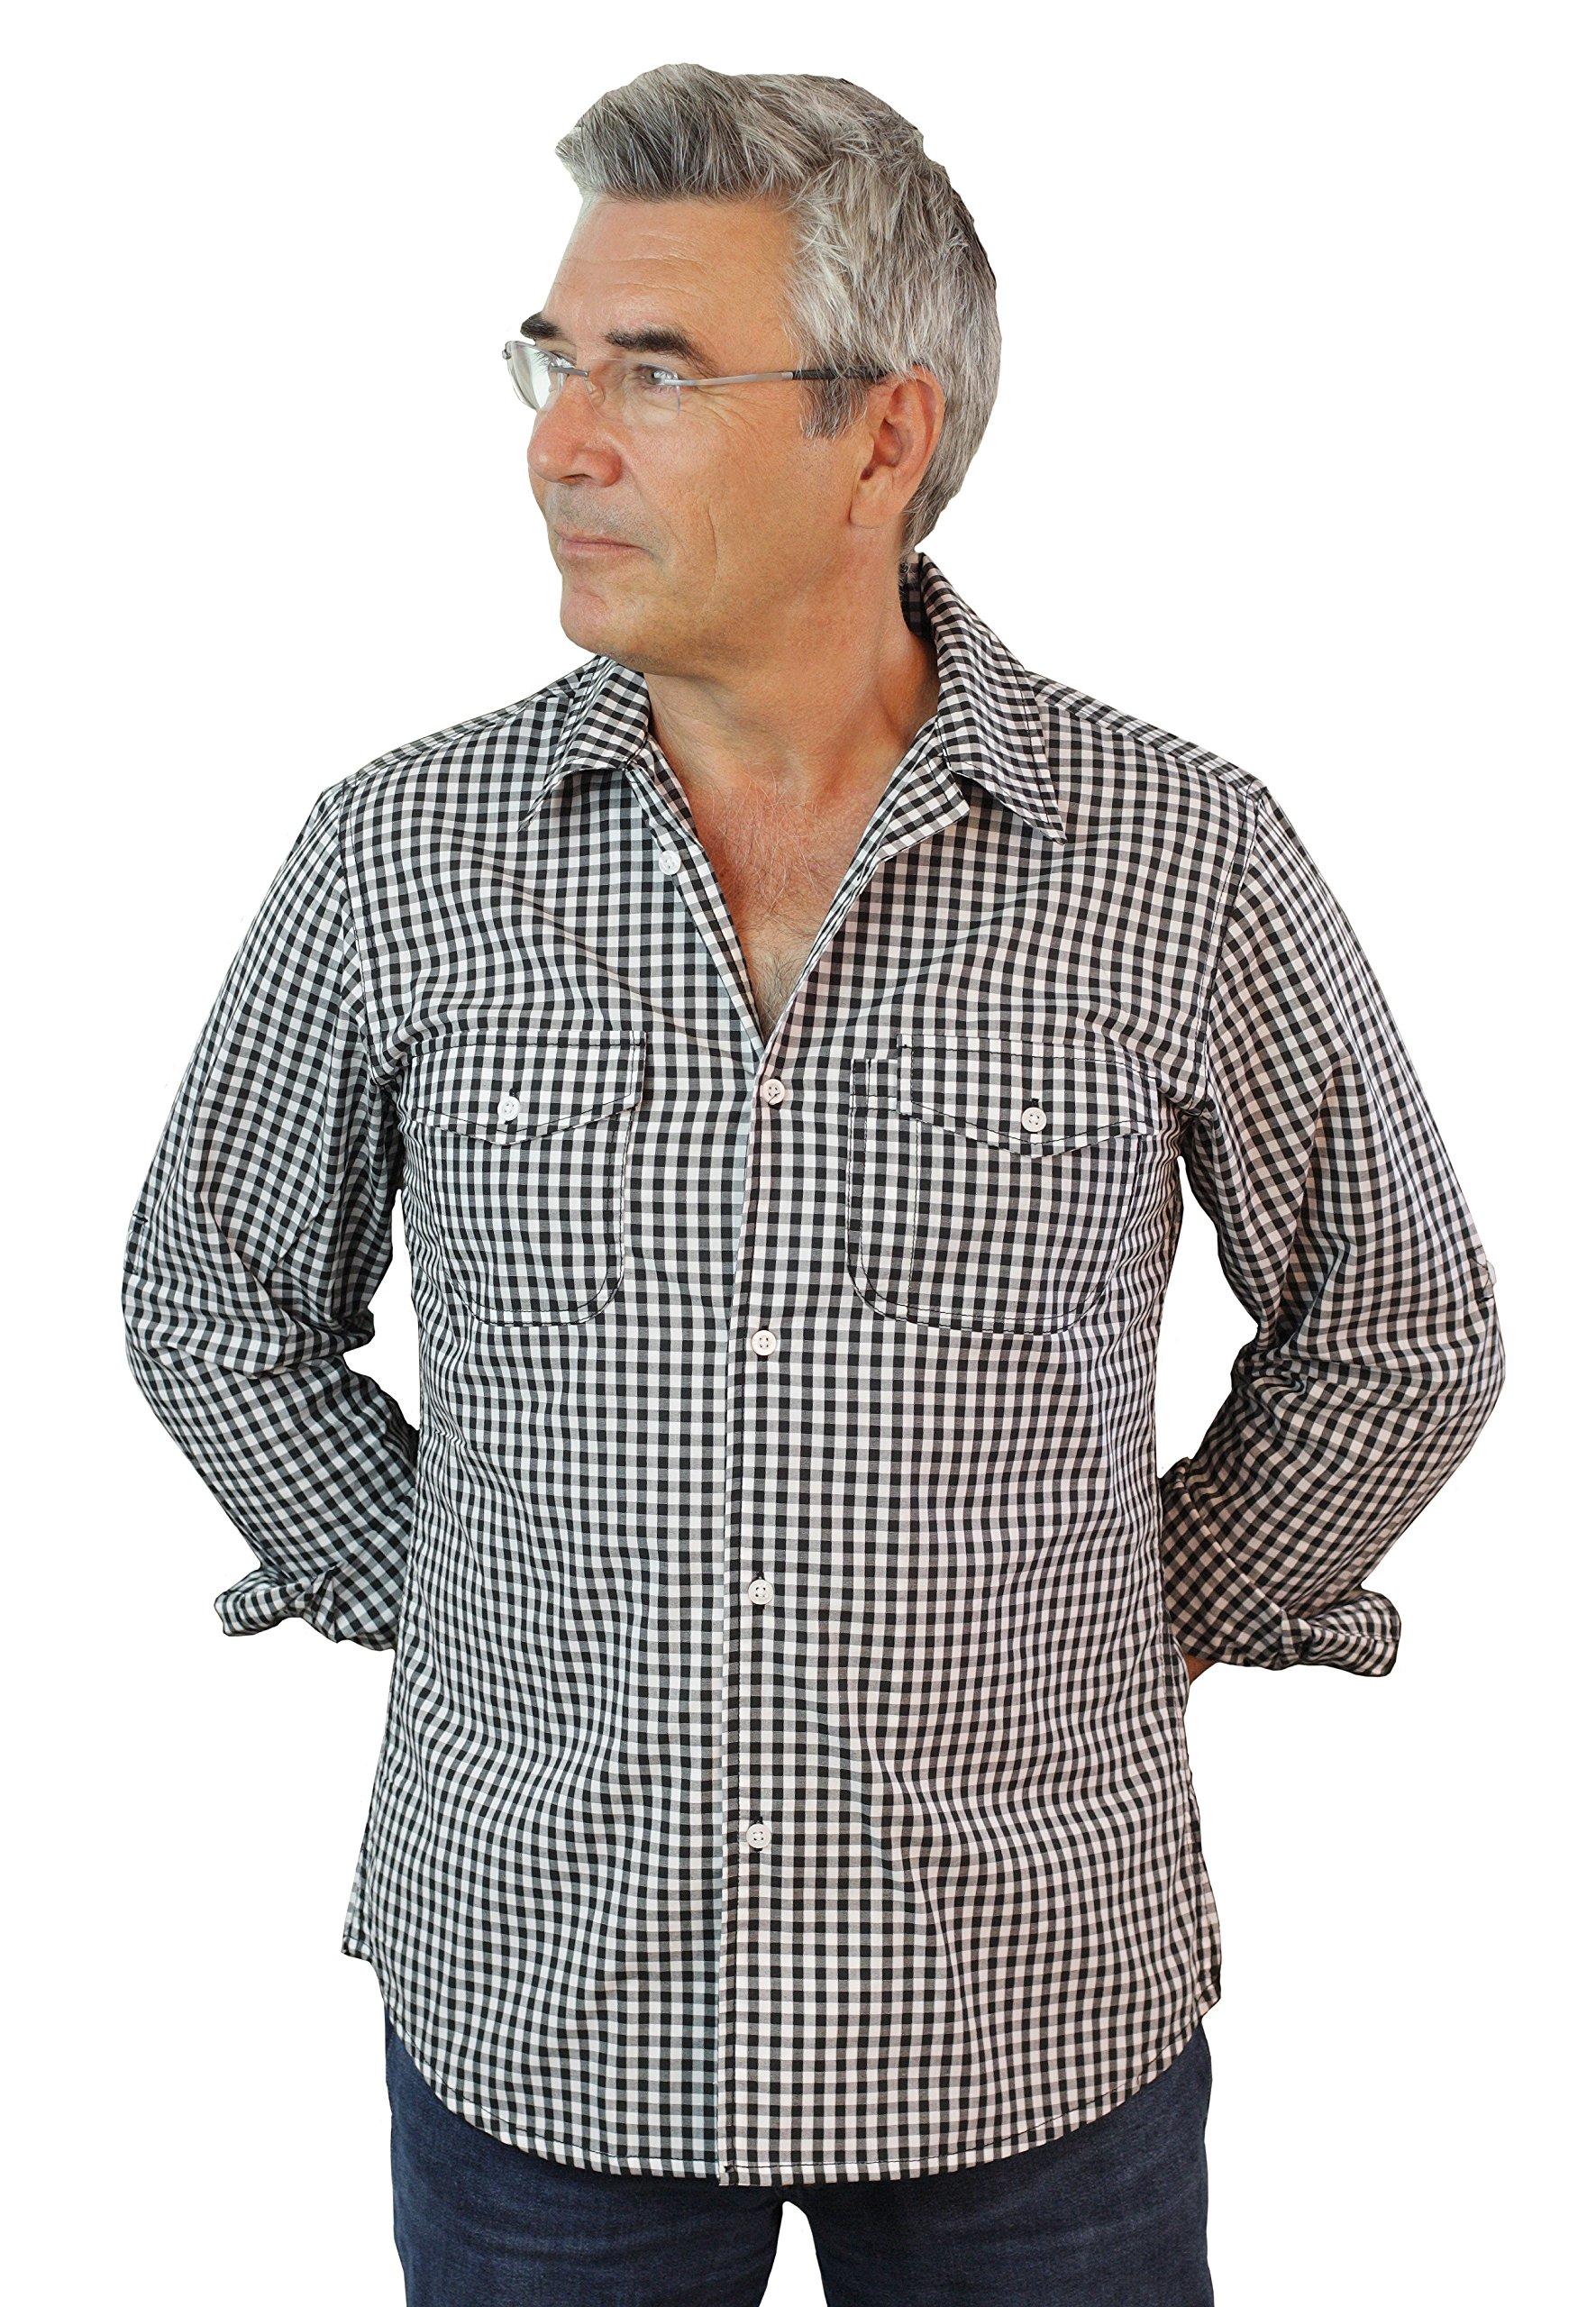 ASD Living Long Sleeve Server Waitstaff ShirtBlack/White, Extra Large, Gingham